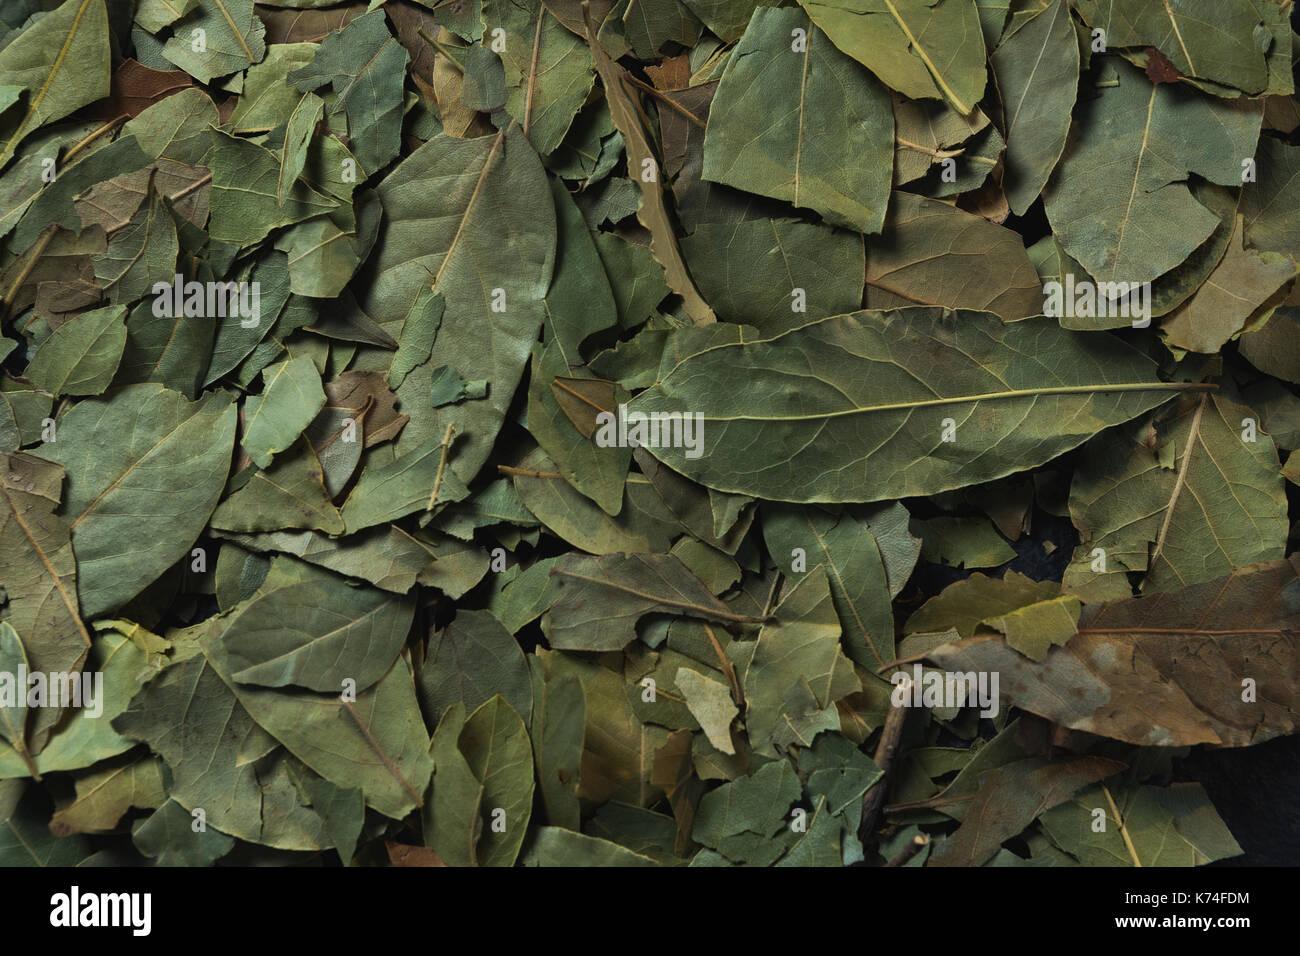 Full frame of bay leaf - Stock Image